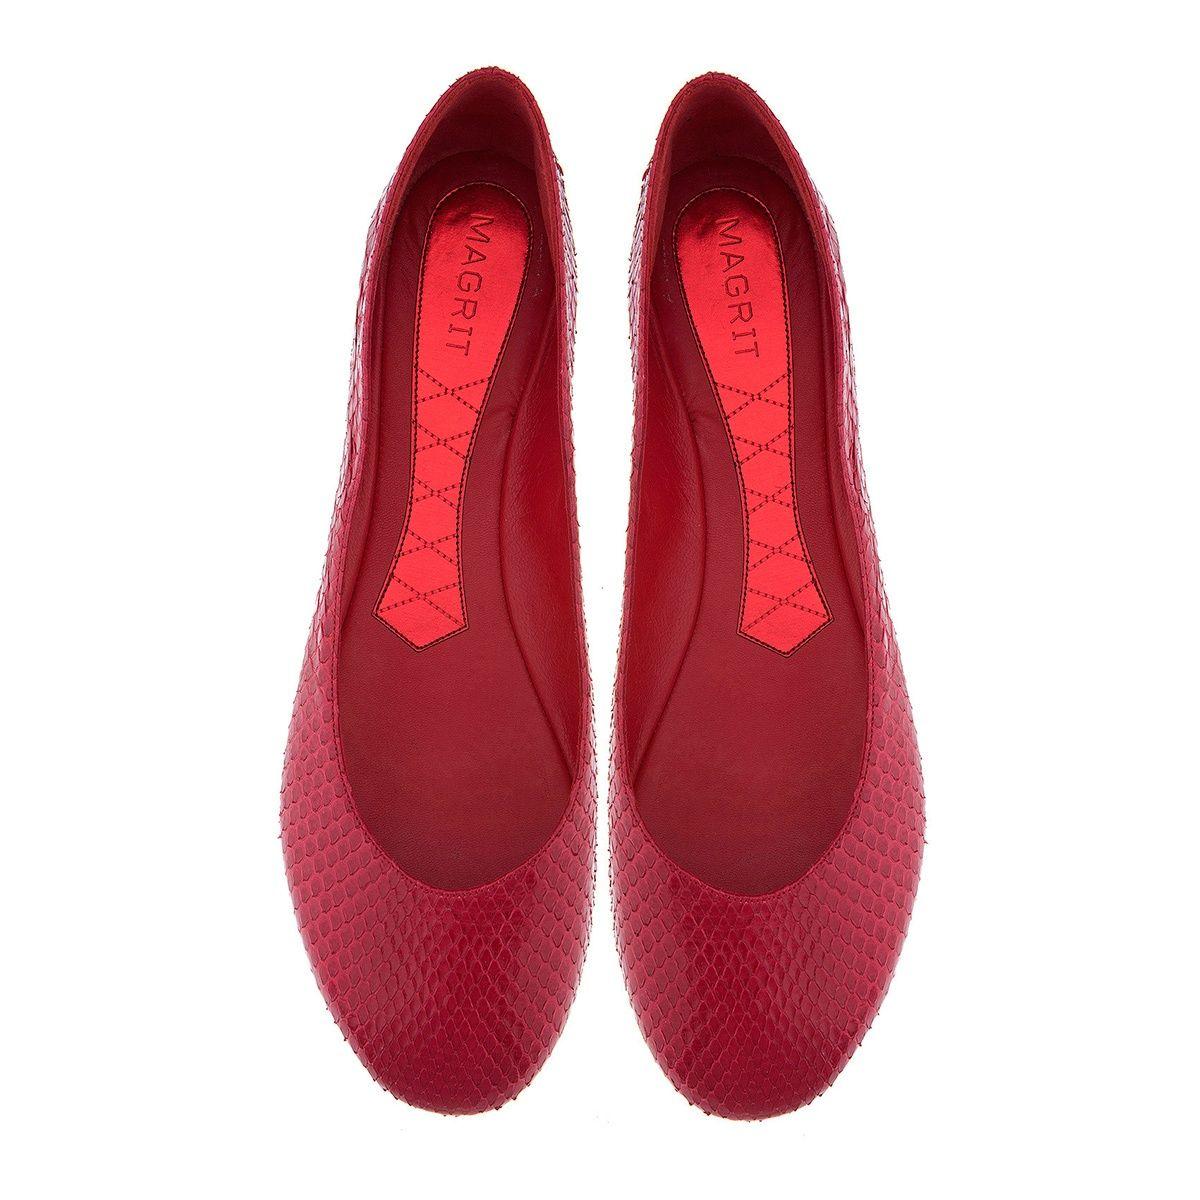 Chaussures - Ballerines Magrit zRPLQK0XL2